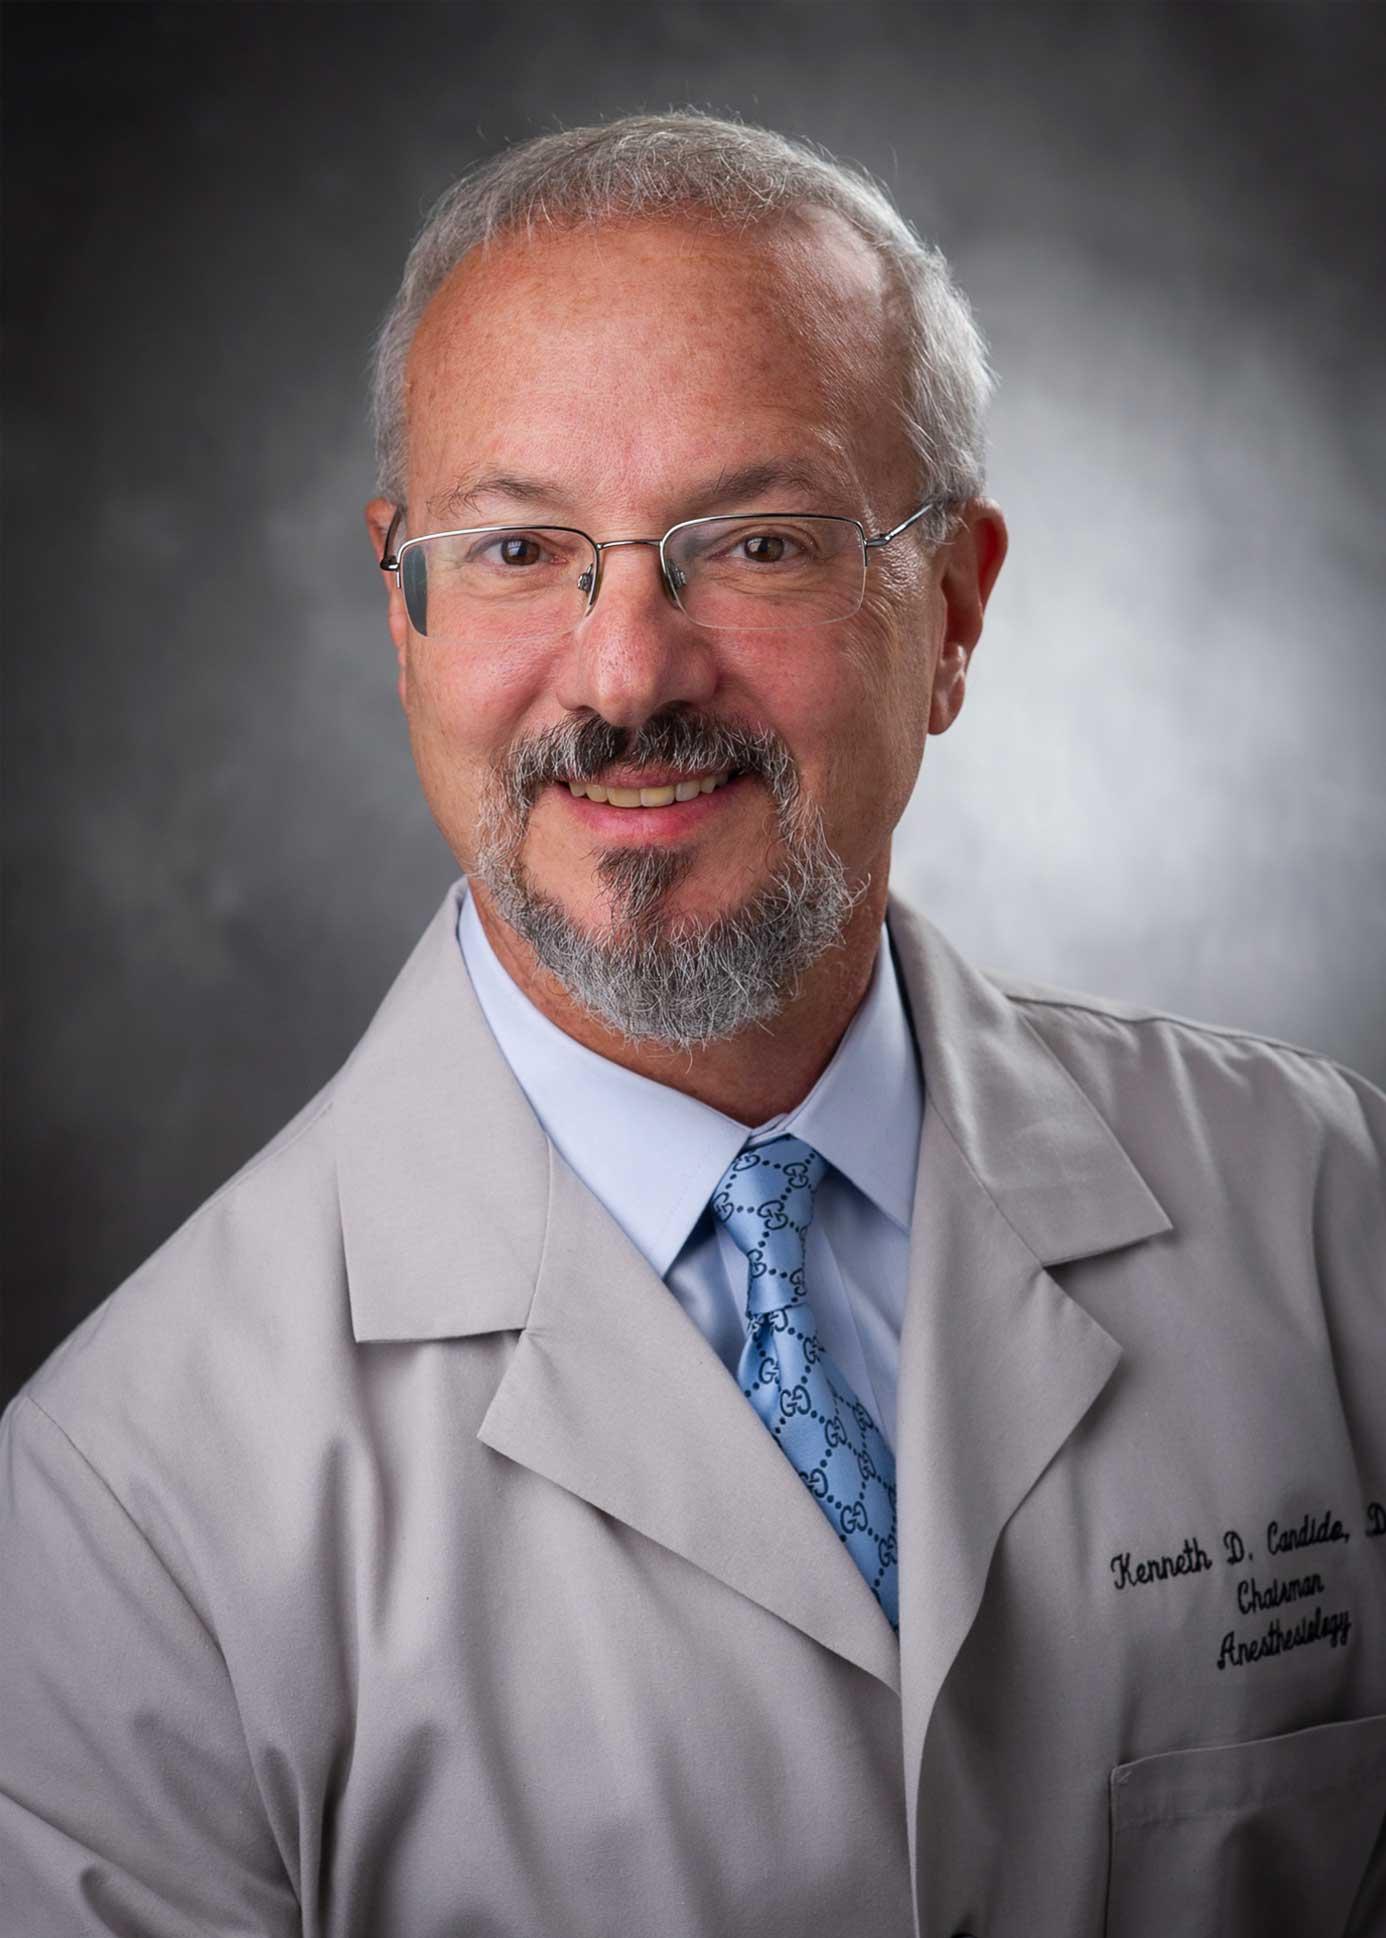 Kenneth Candido, M.D.